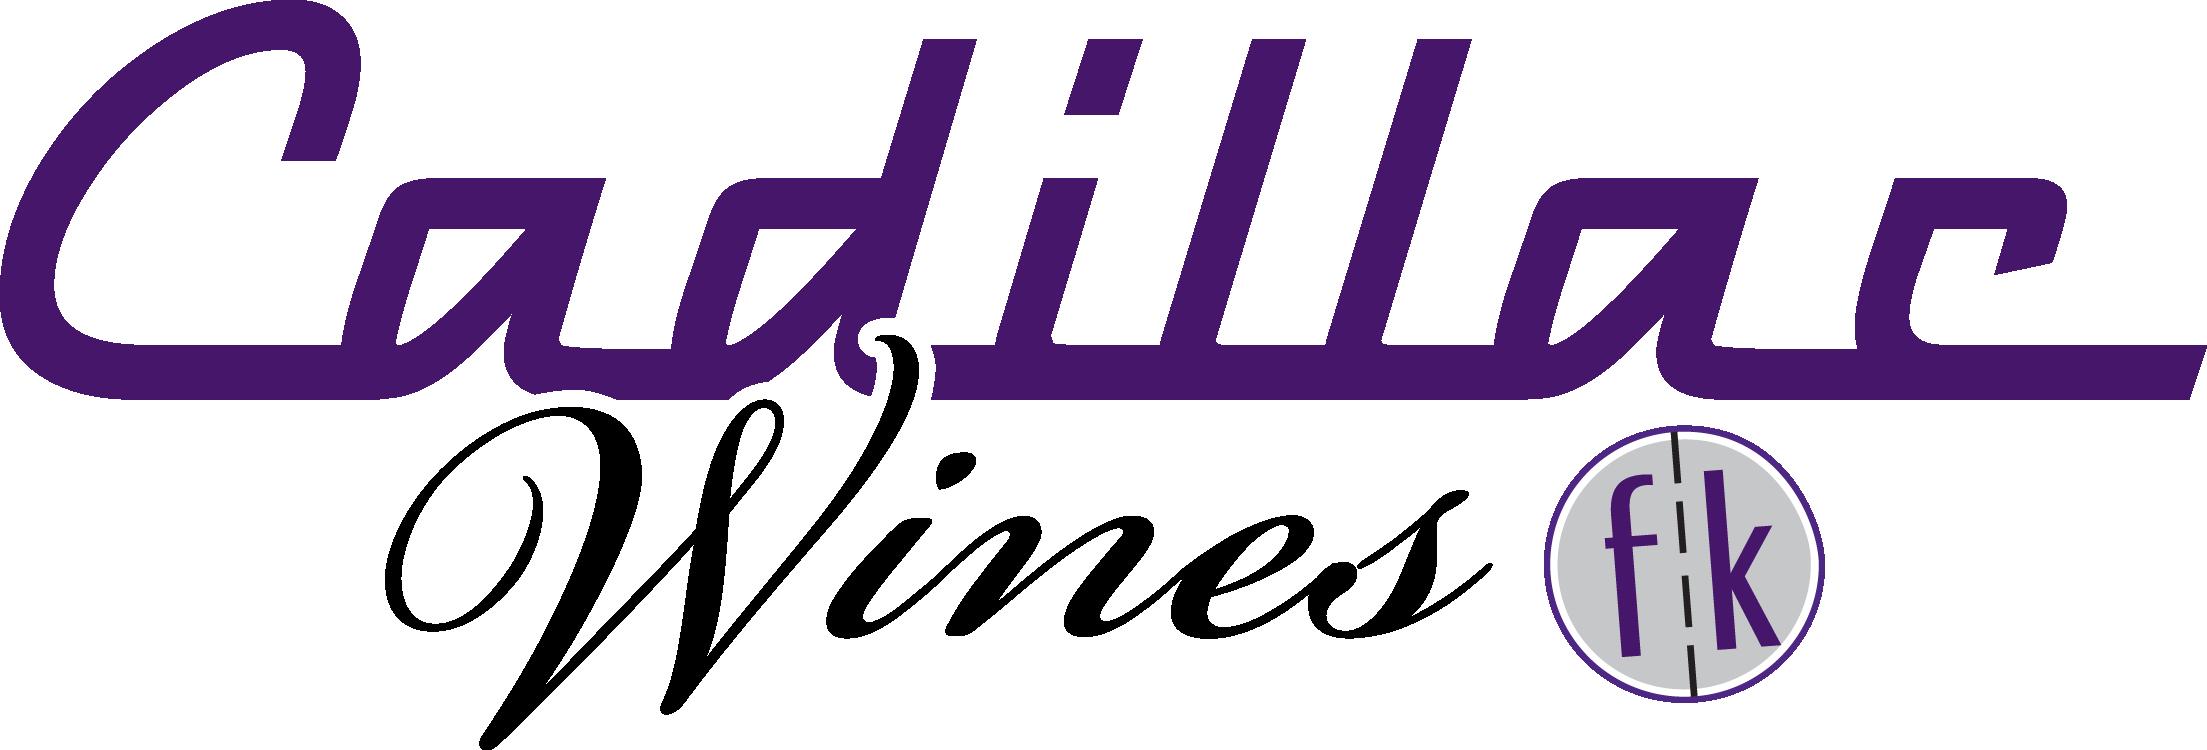 pngkit_cadillac-logo-png_1436535.png